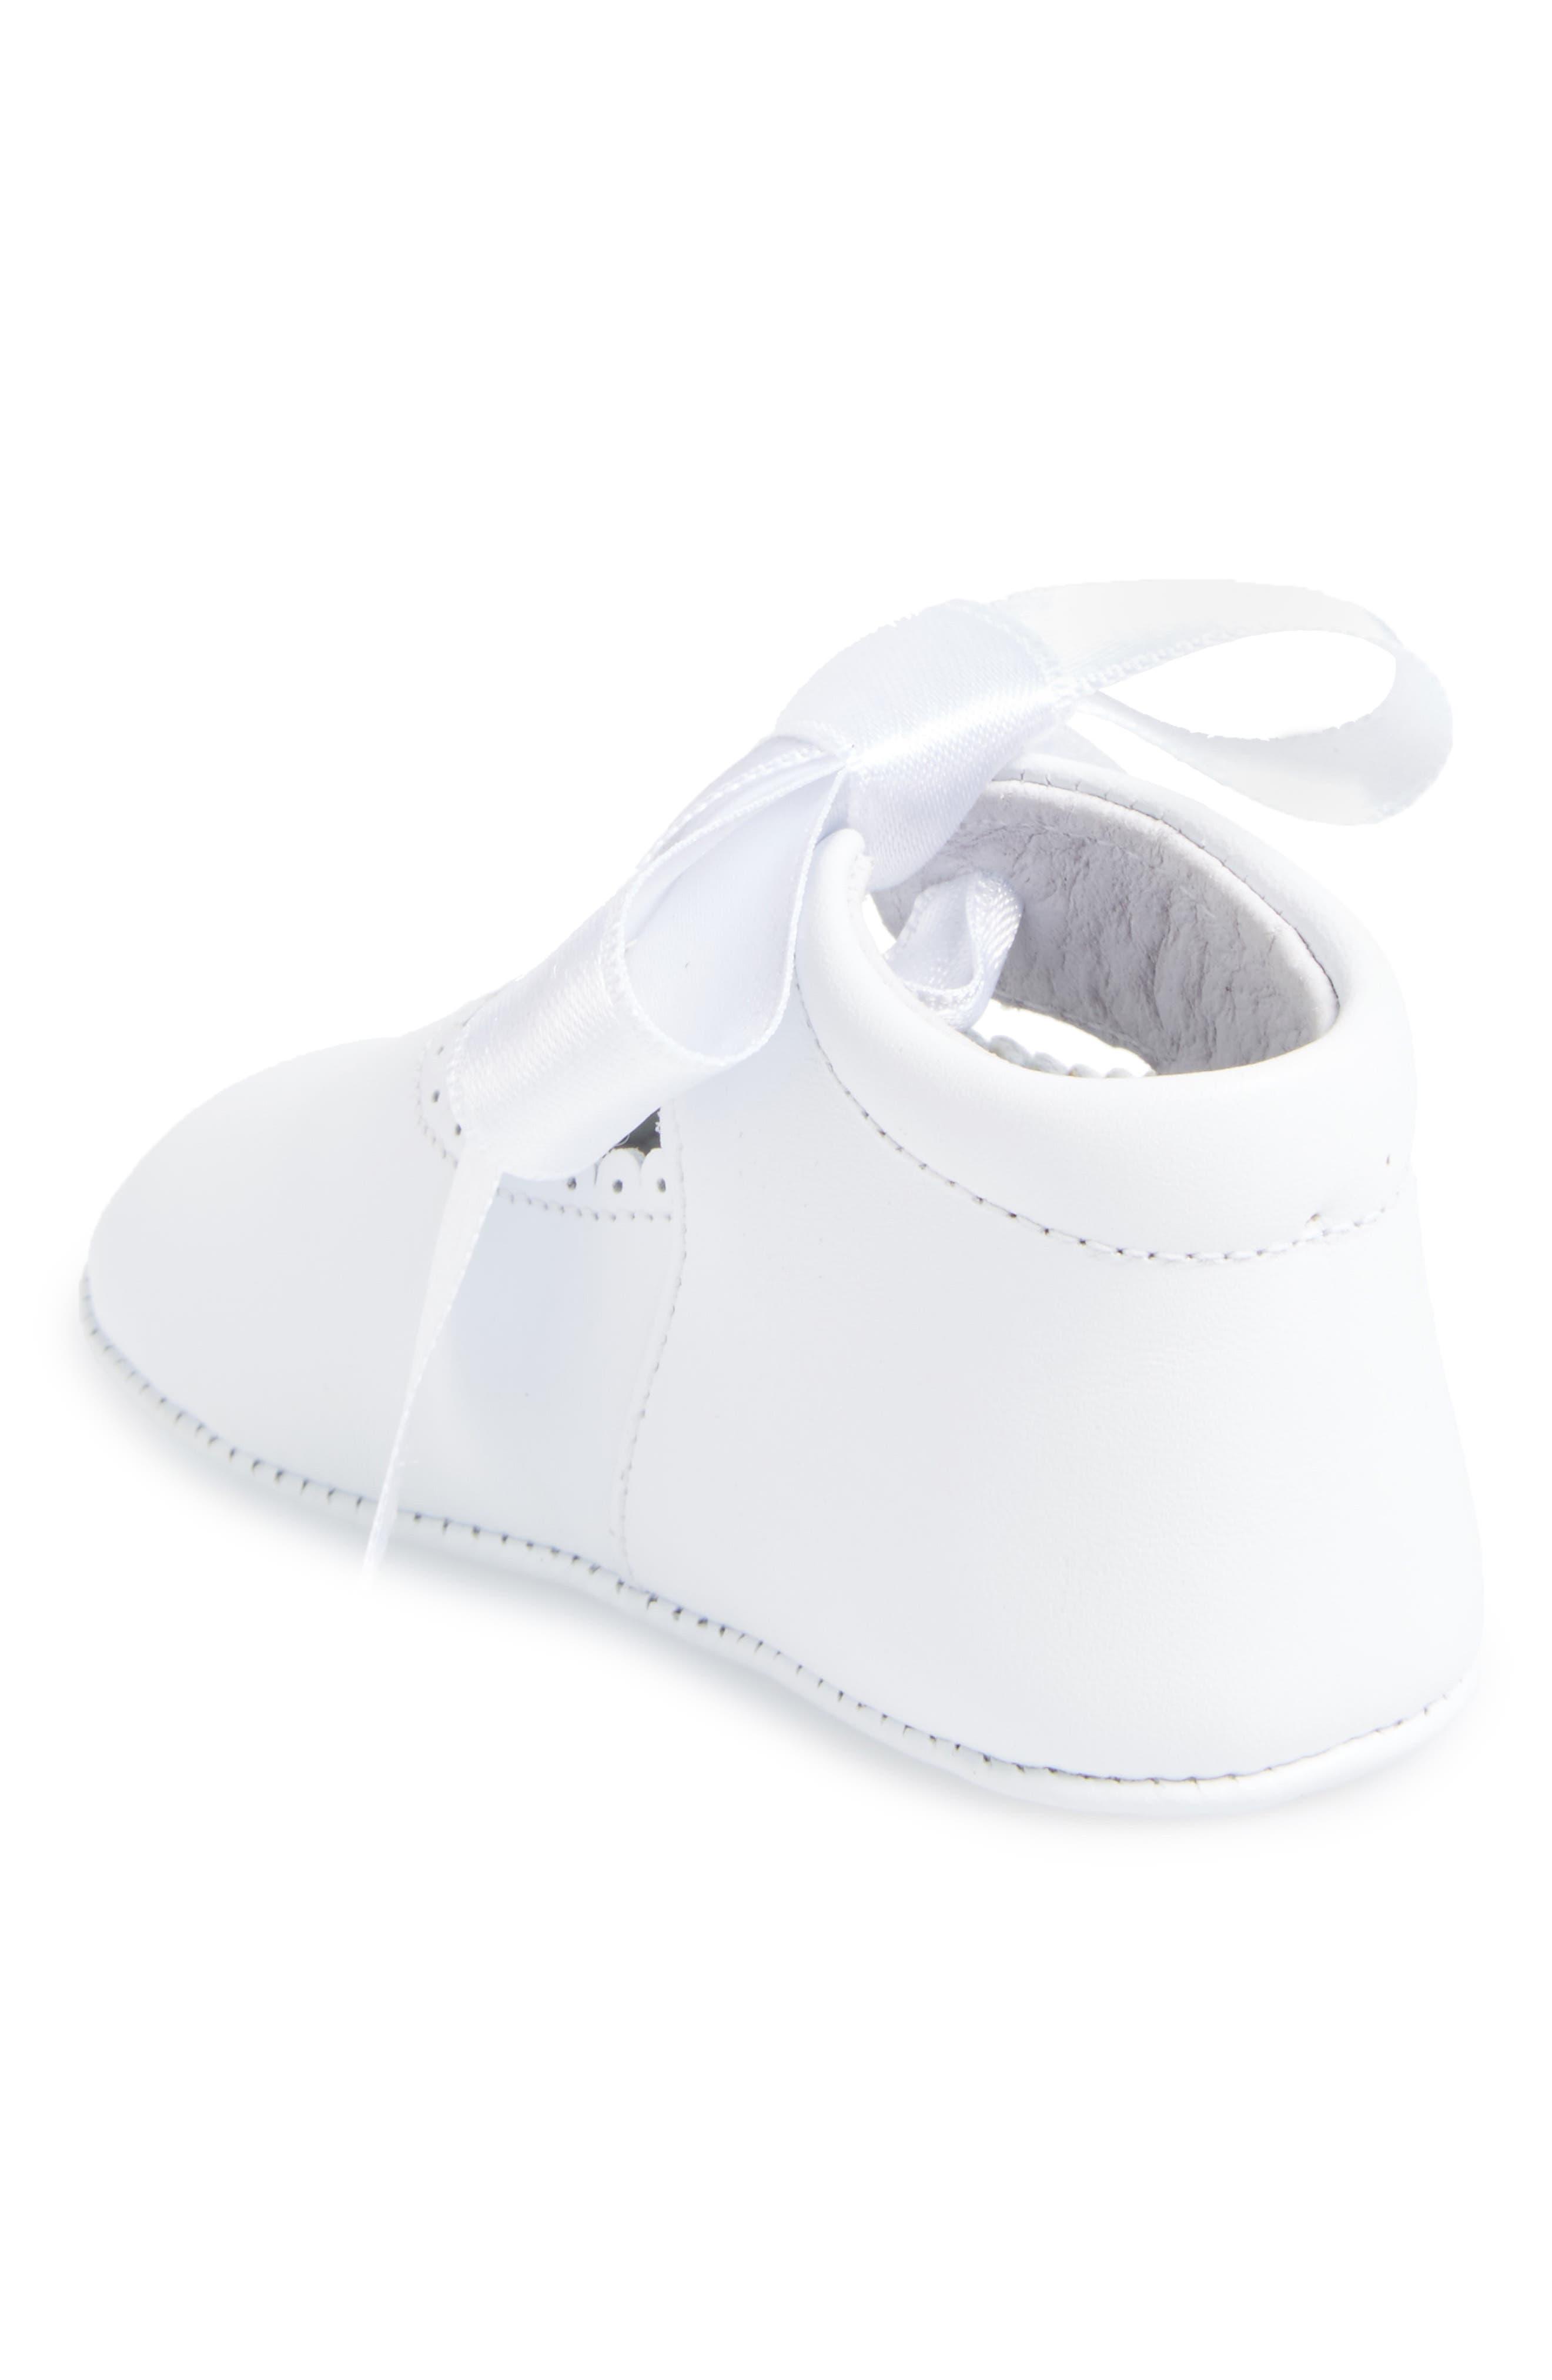 Satin Bow Crib Shoe,                             Alternate thumbnail 2, color,                             WHITE